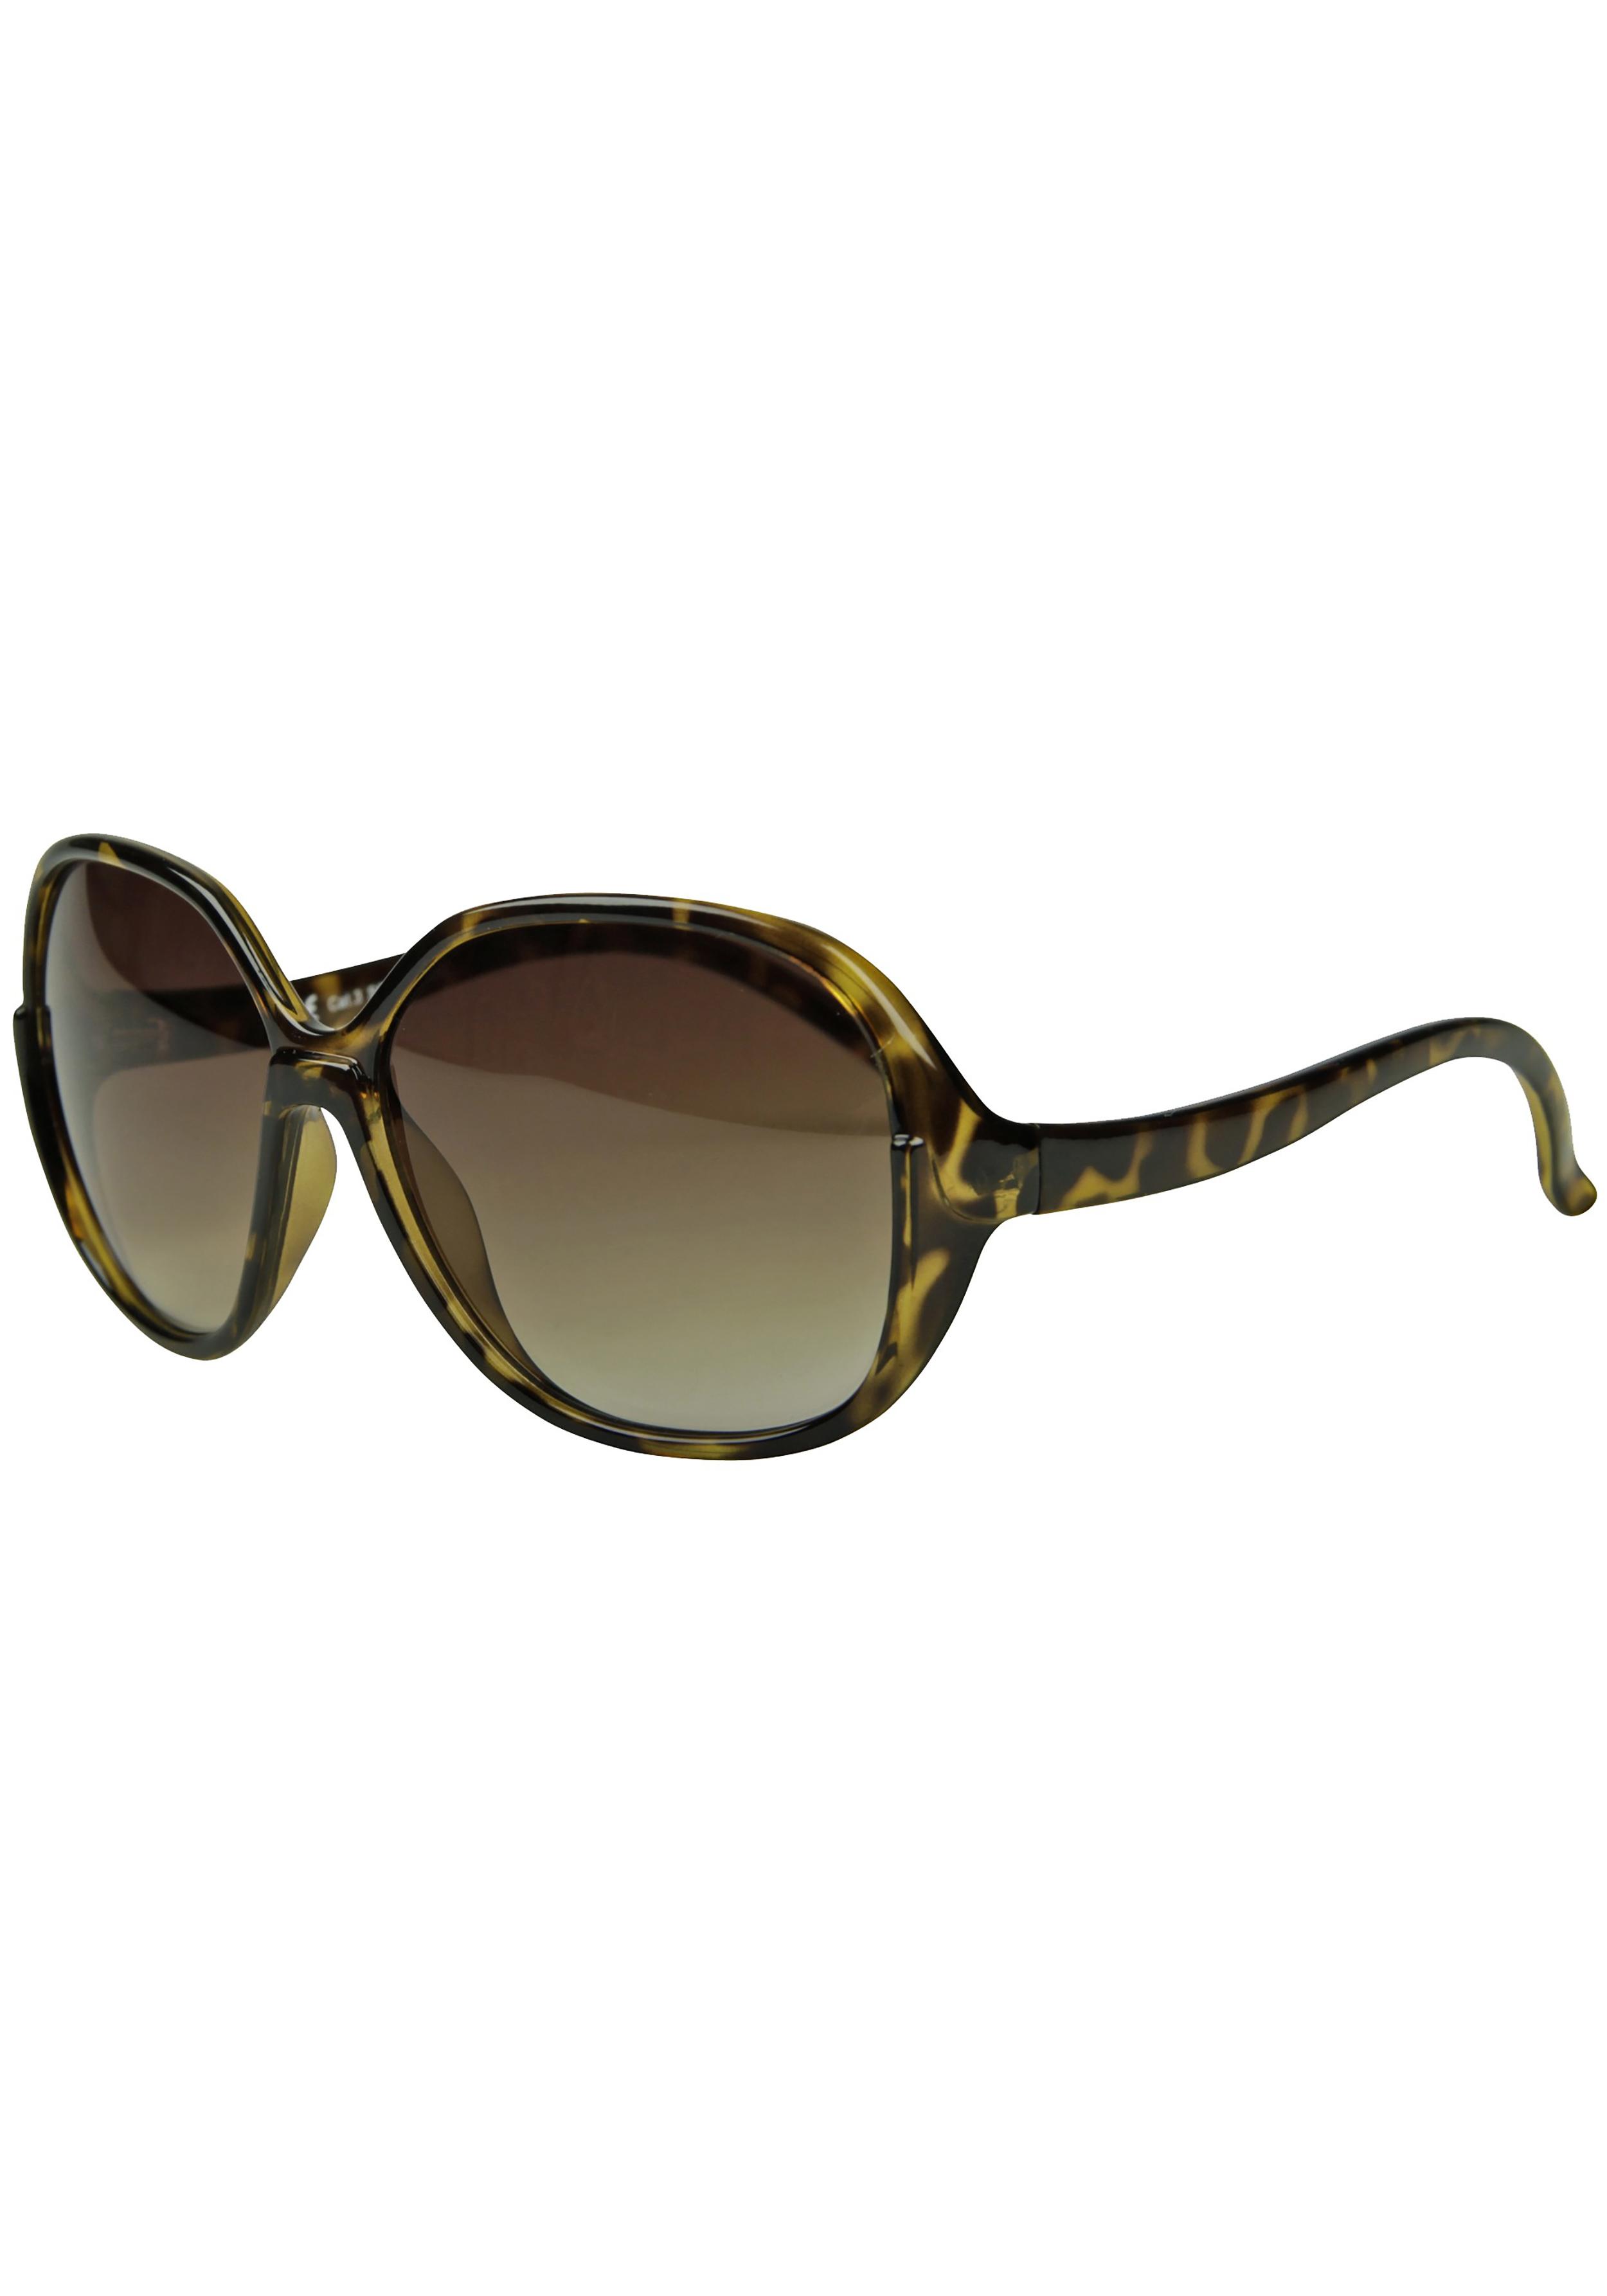 Große runde Sonnenbrille im Leodesign